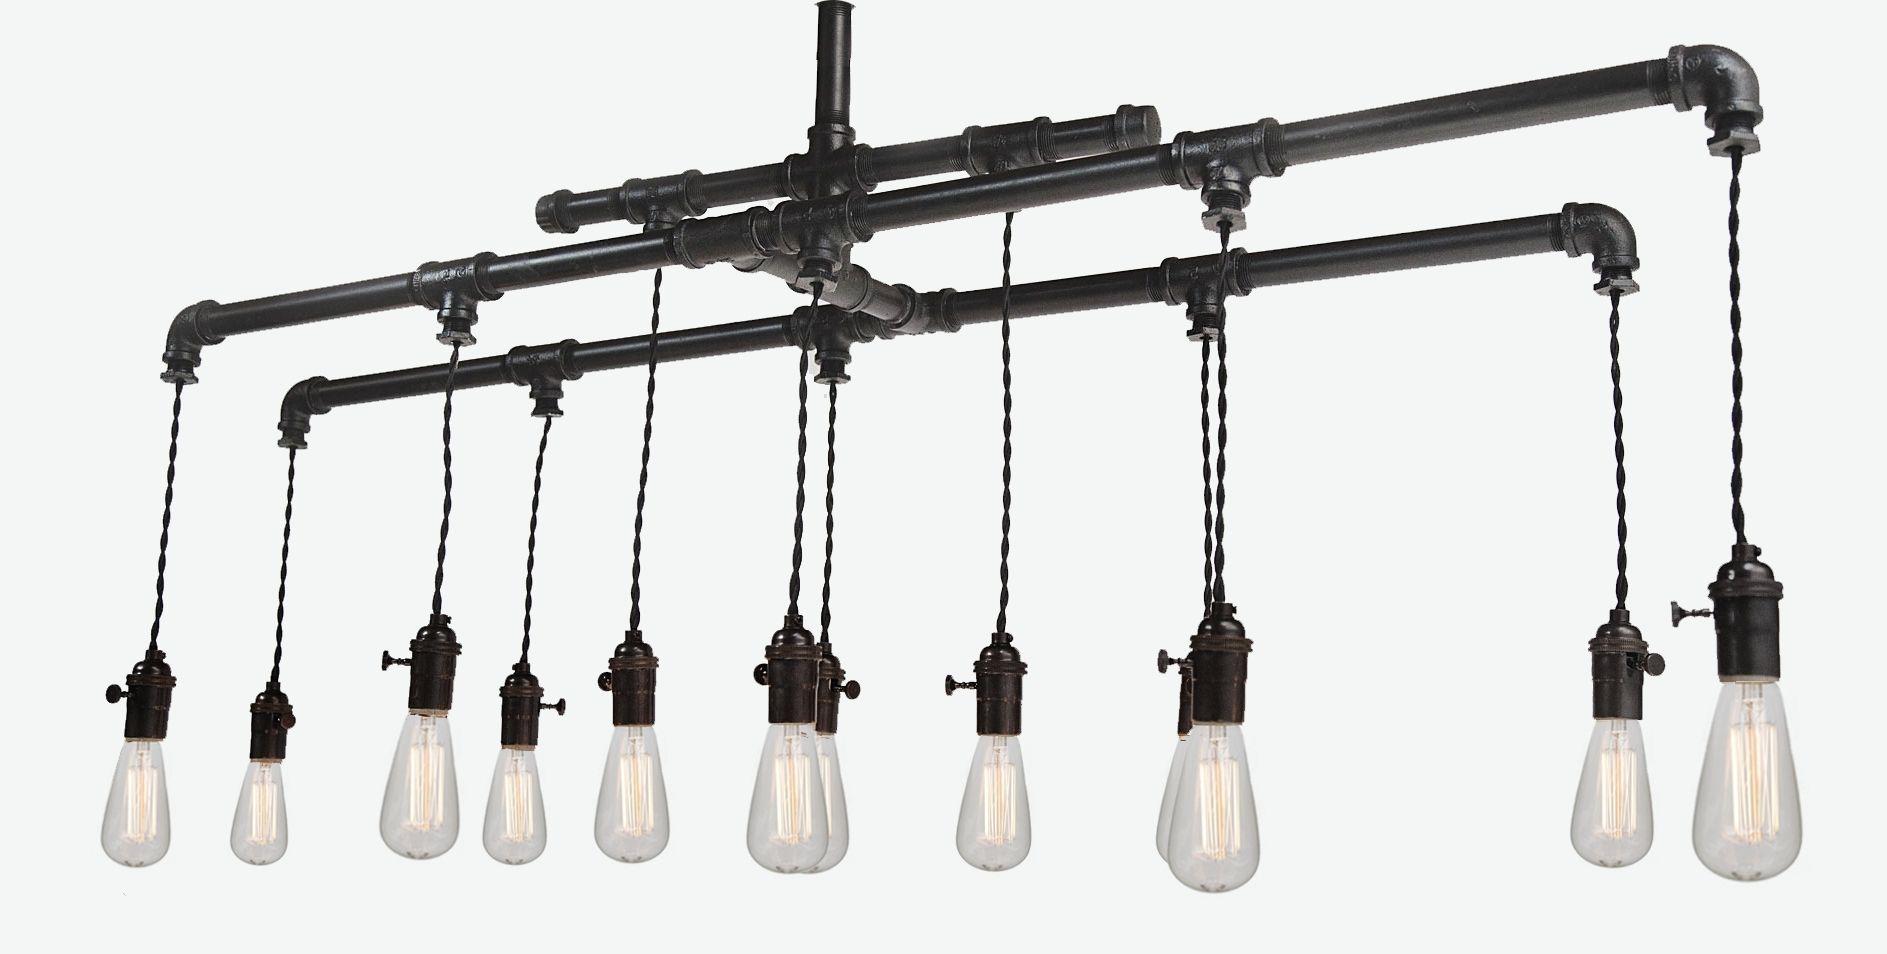 Modern Outdoor Lamps